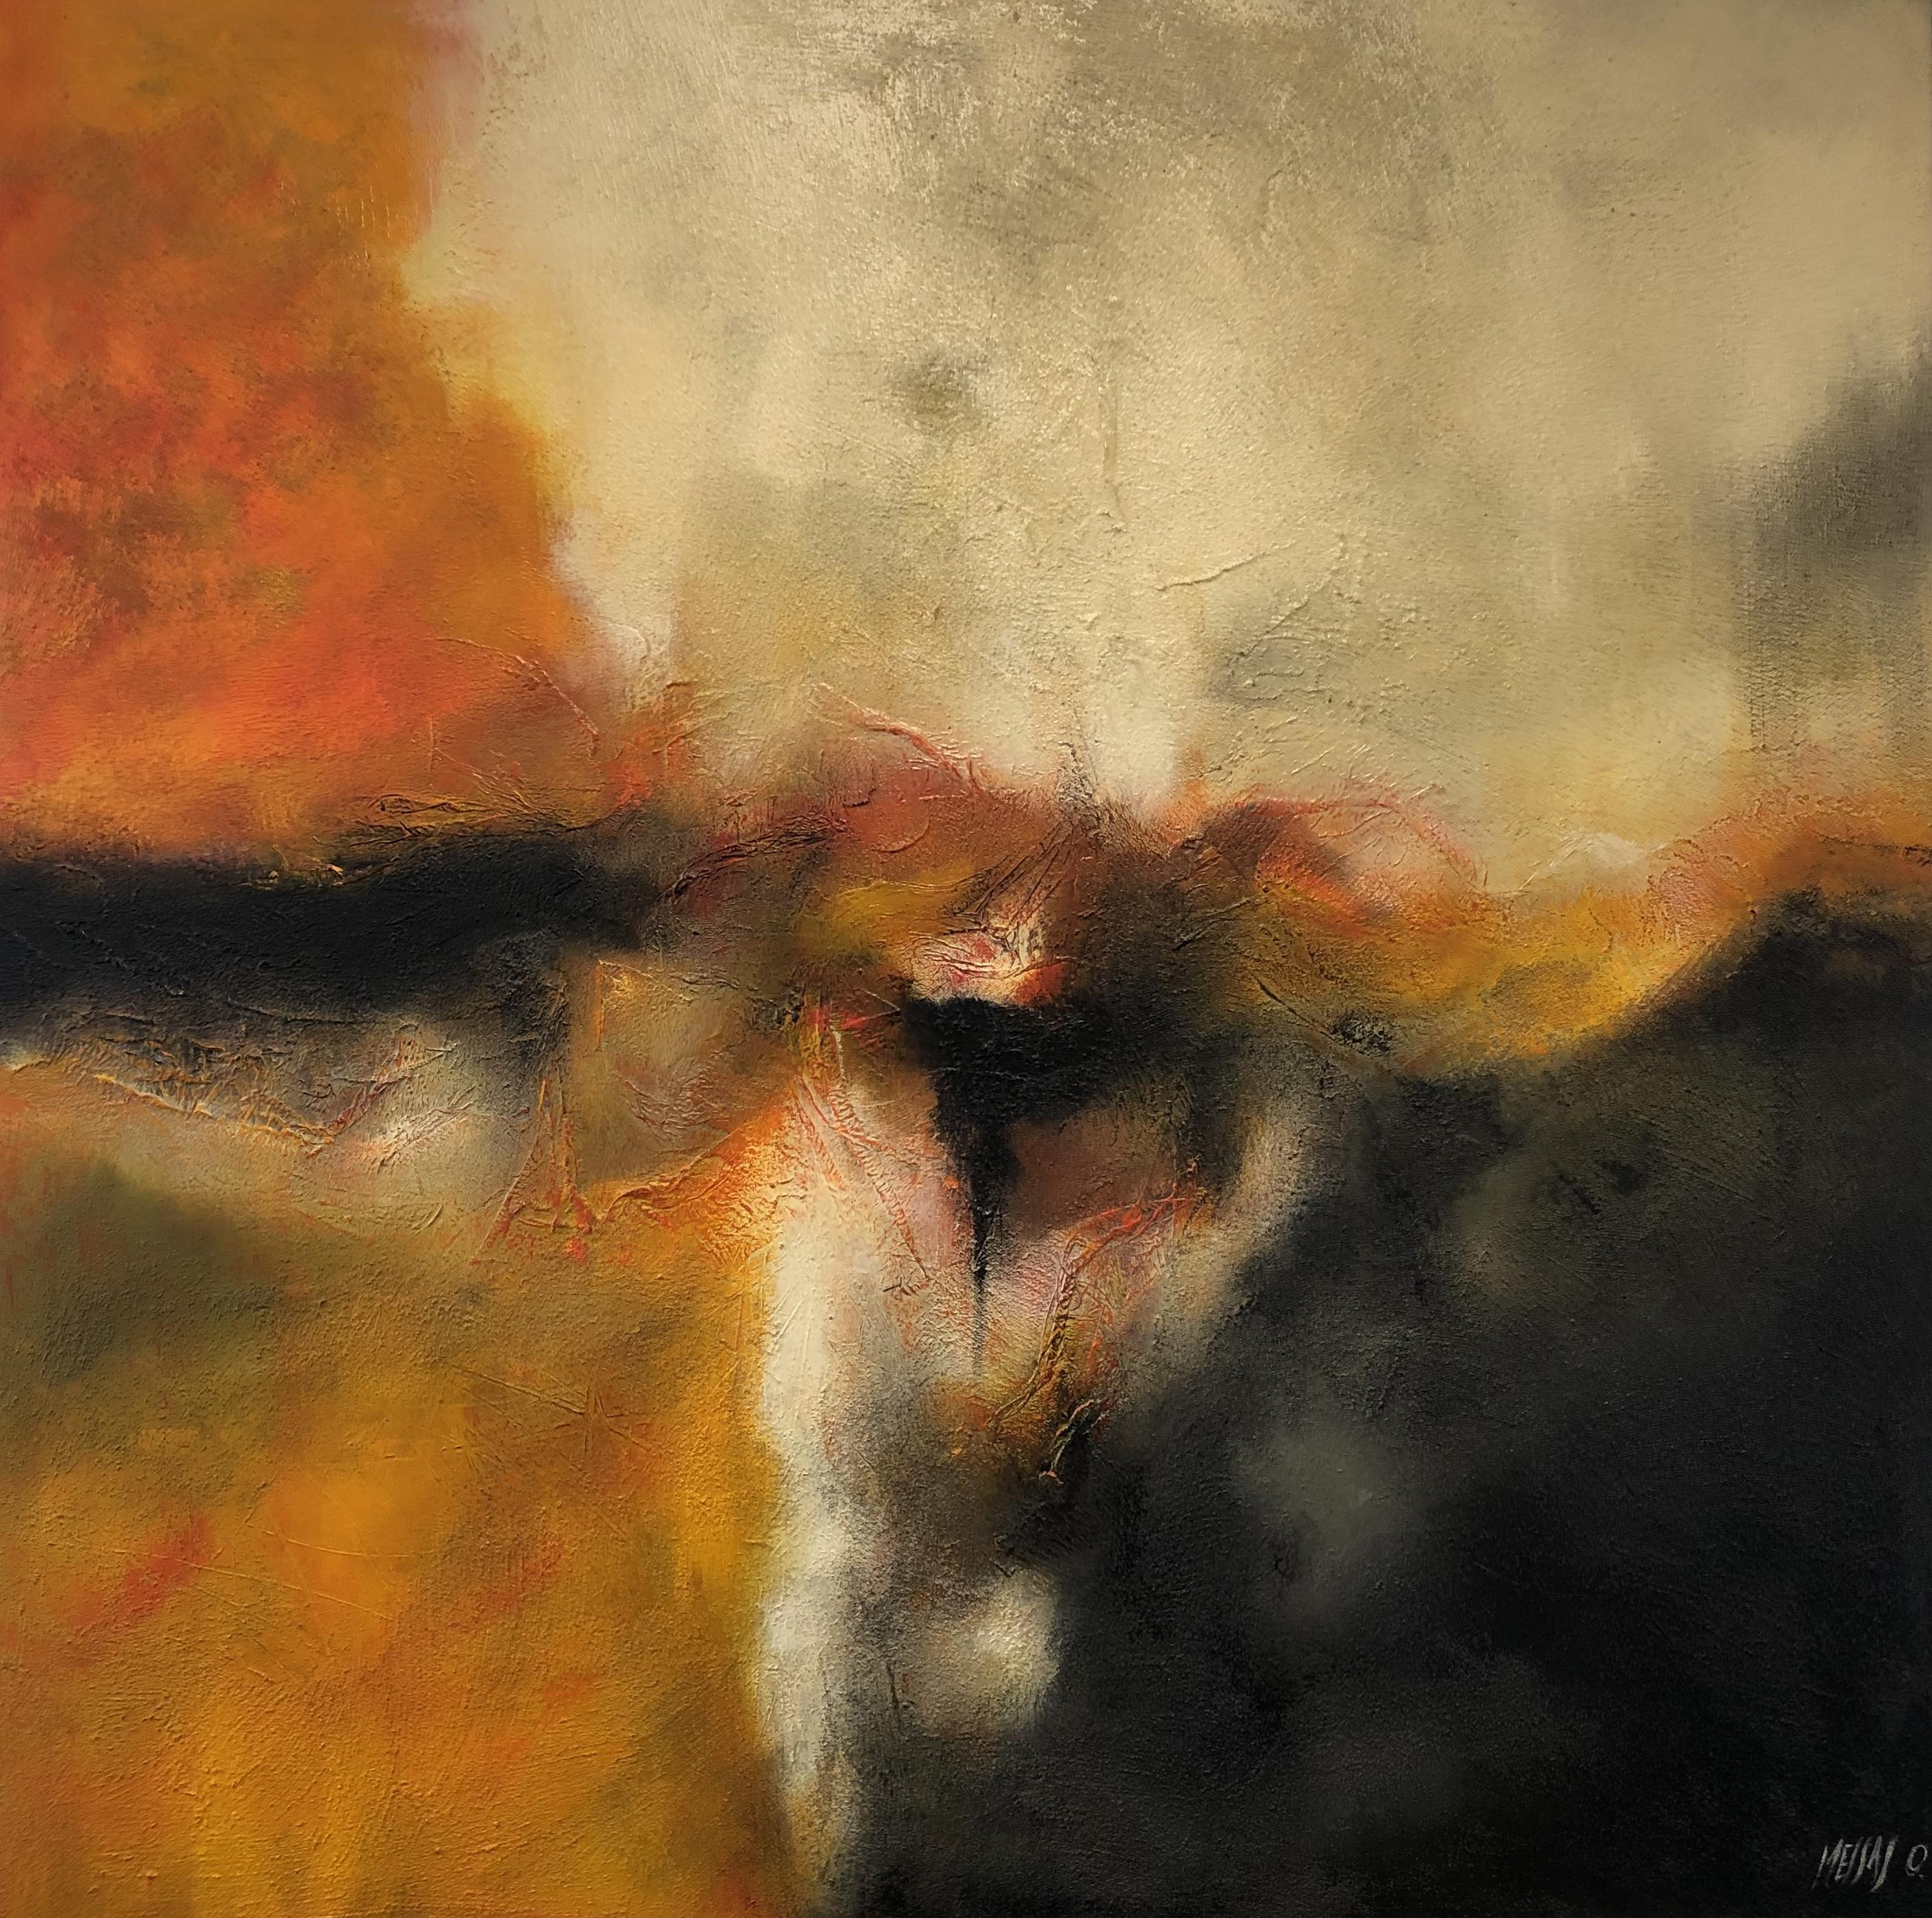 Reverie by Olivier Messas